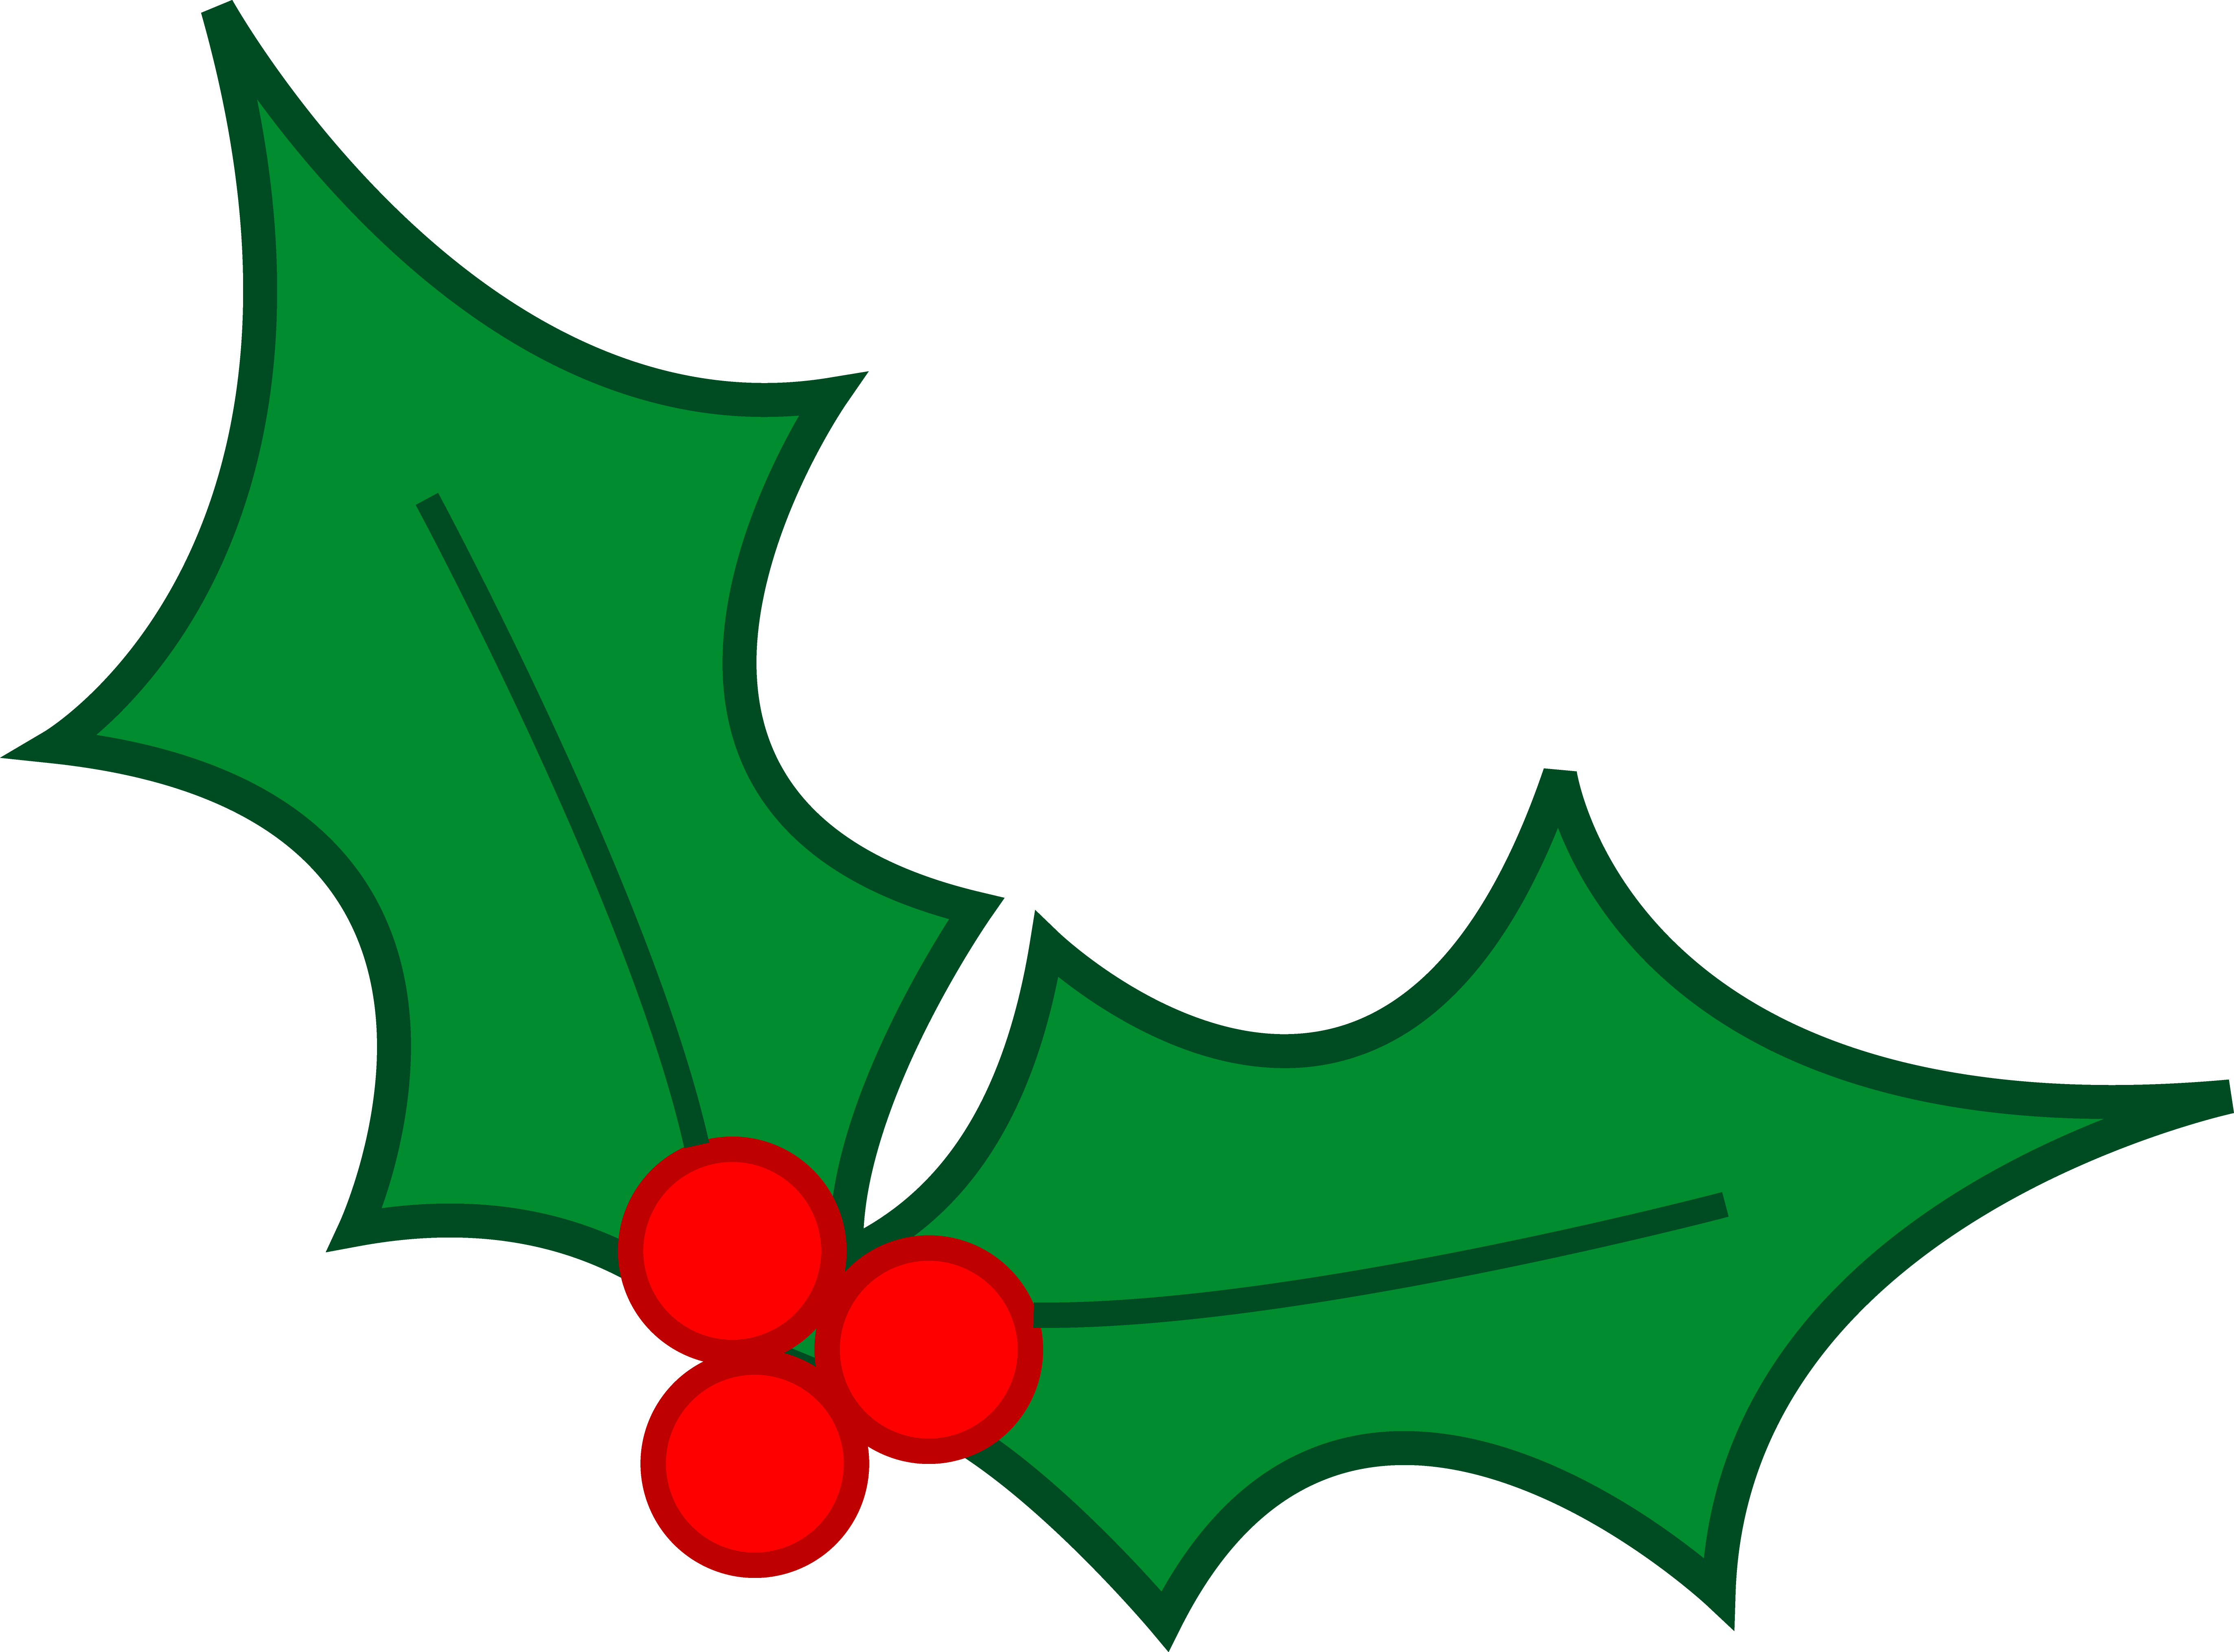 Christmas tree clipart-Christmas tree clipart-16